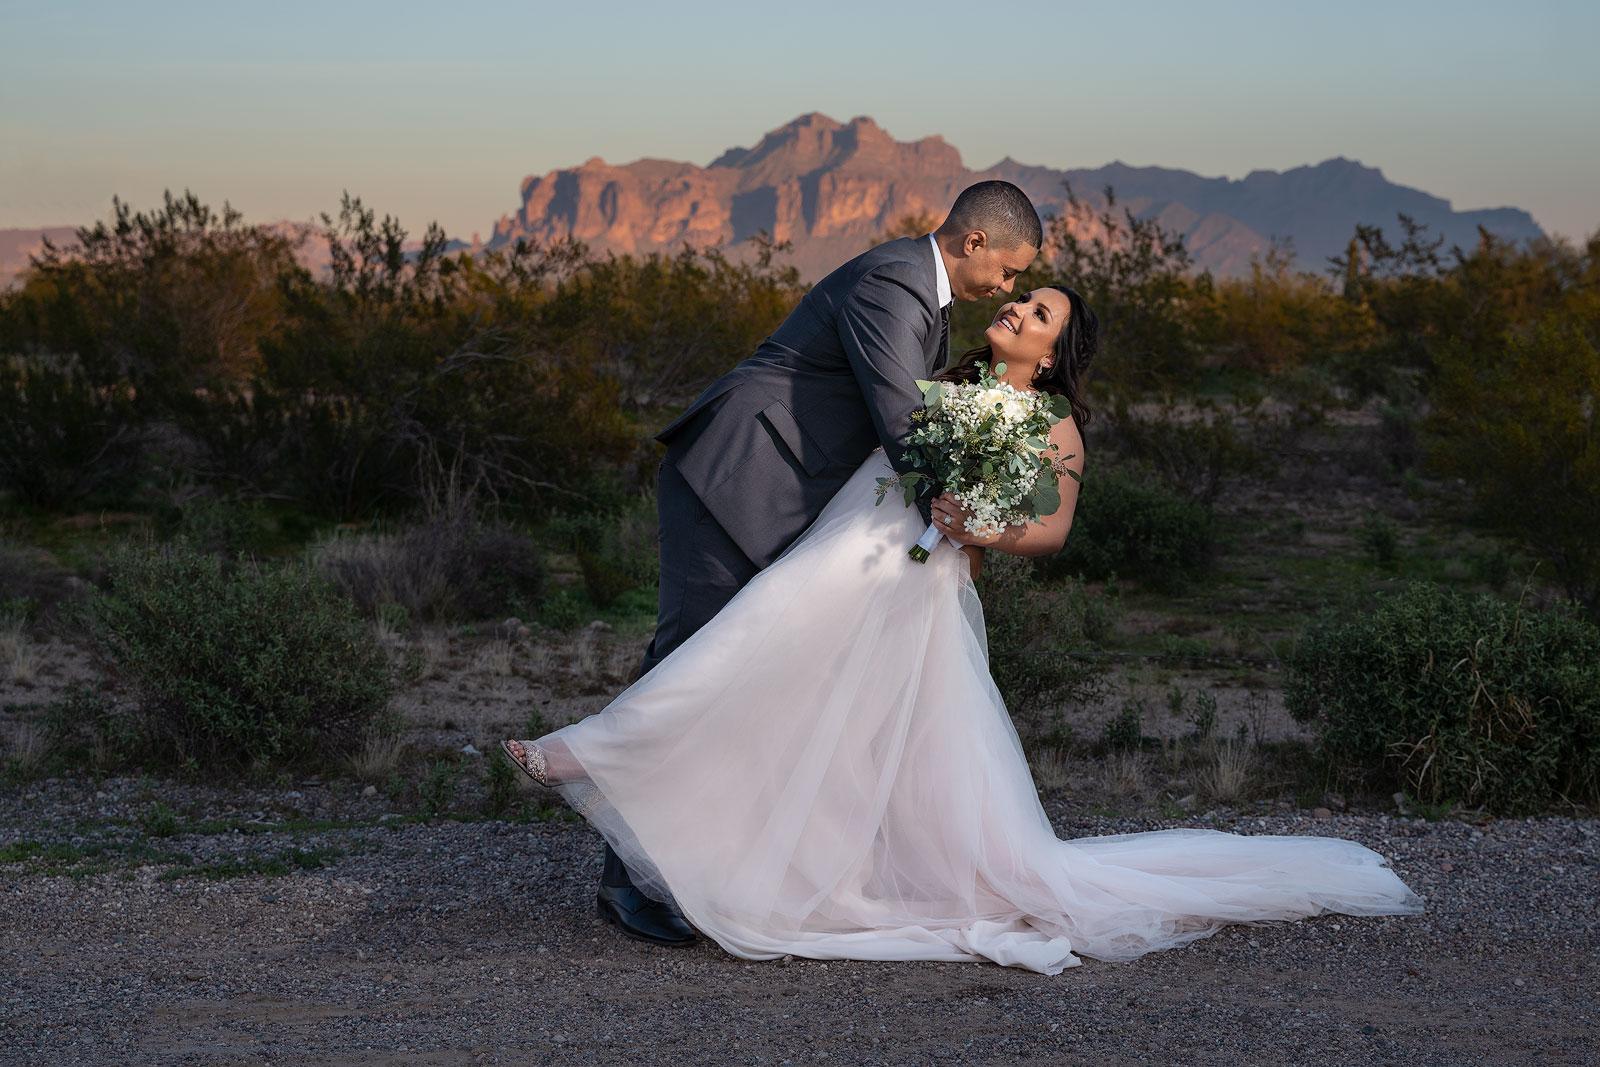 Amanda and Justin wedding dip at sunset